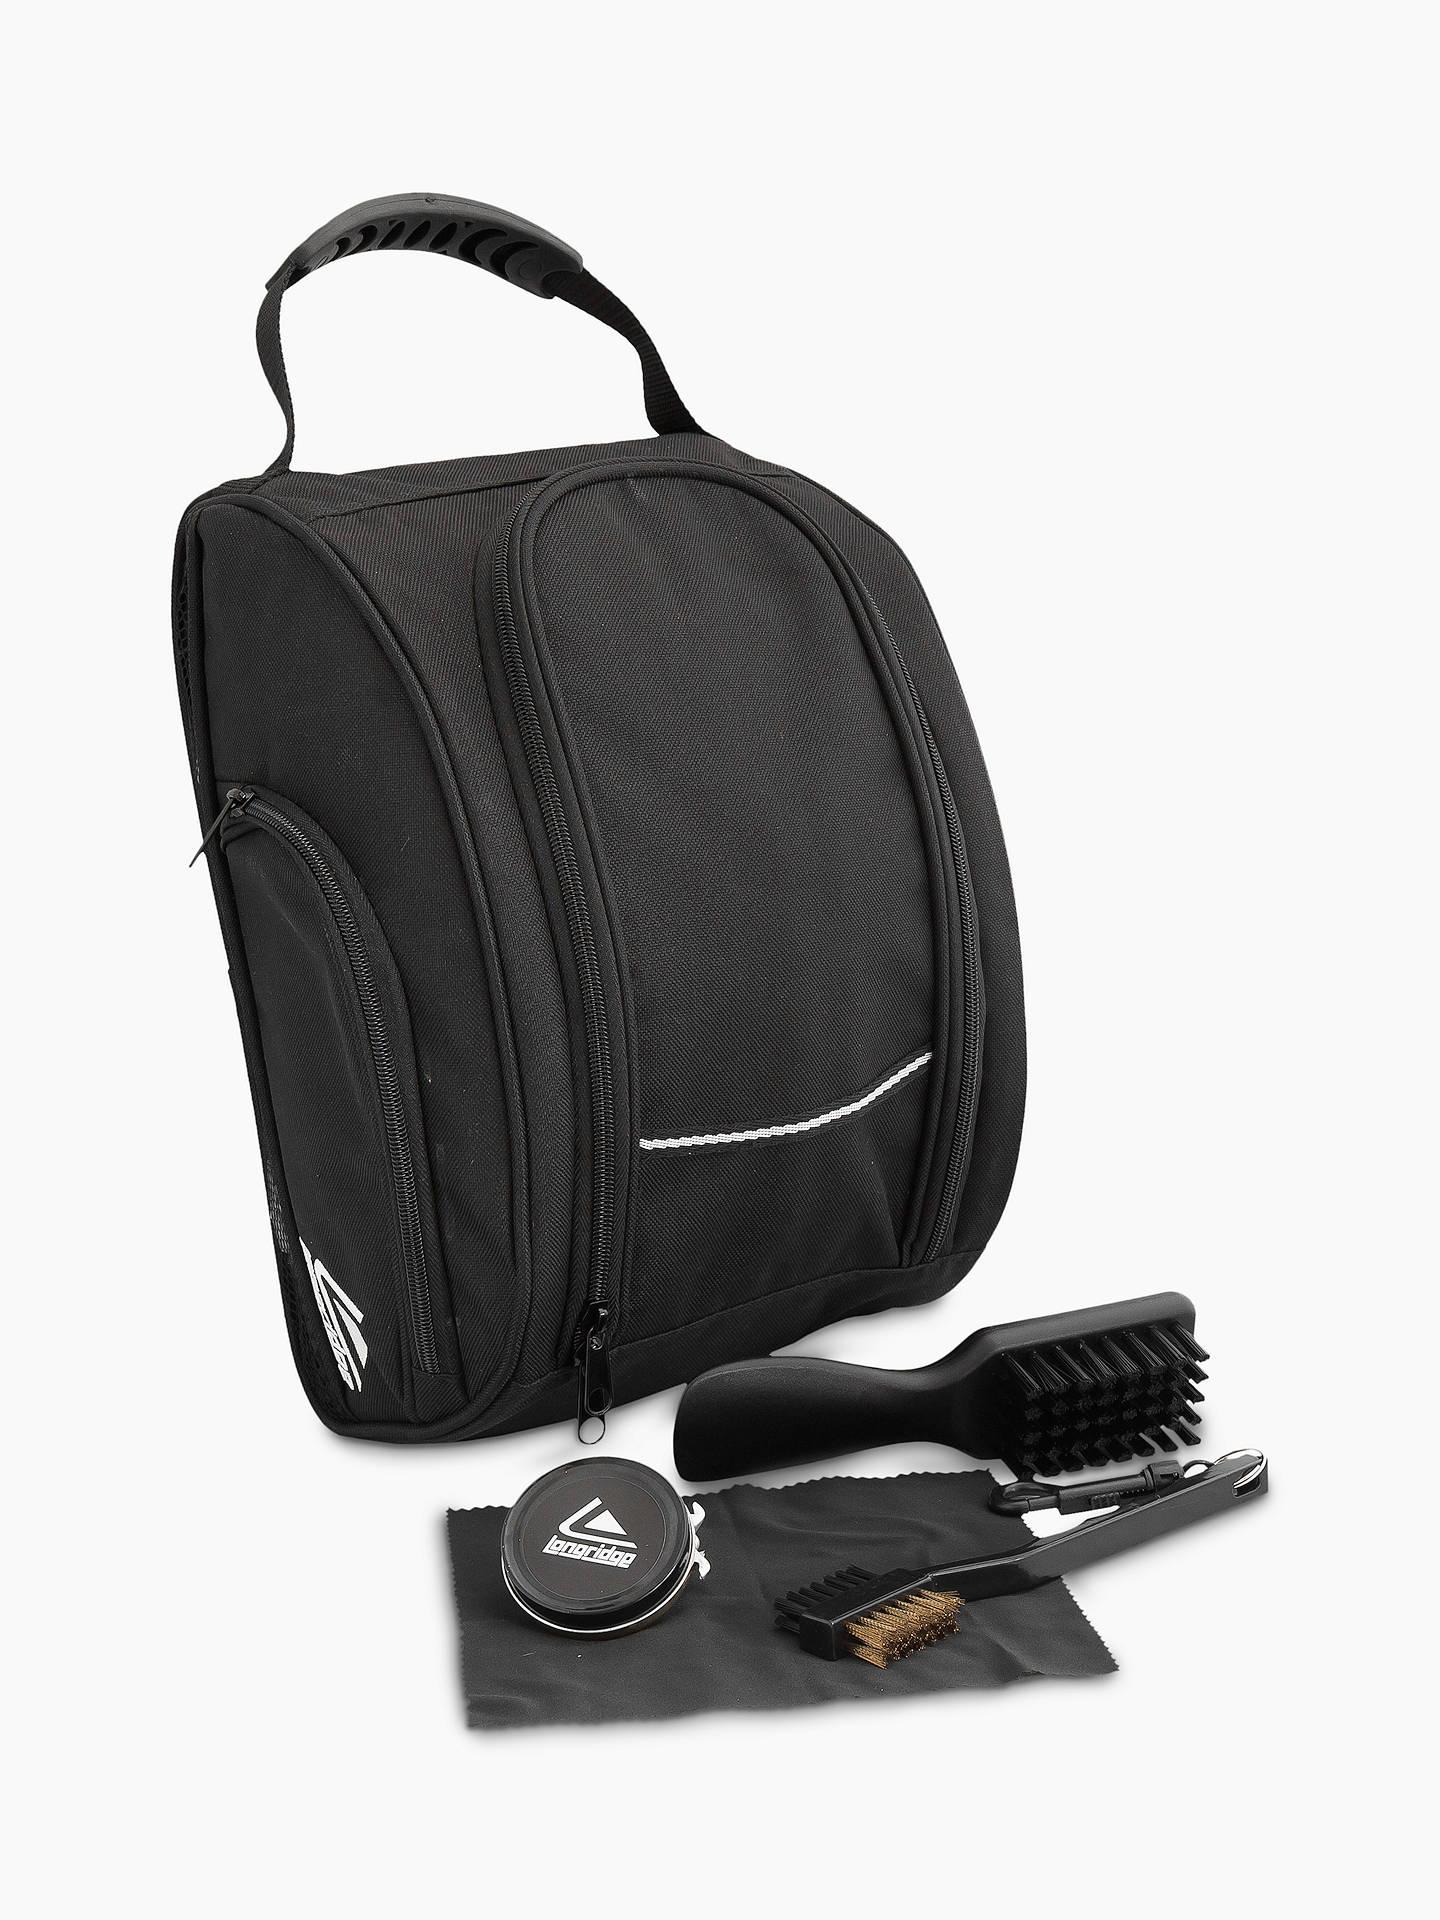 Golf Shoe Bag >> Longridge Executive Golf Shoe Bag And Accessories Set